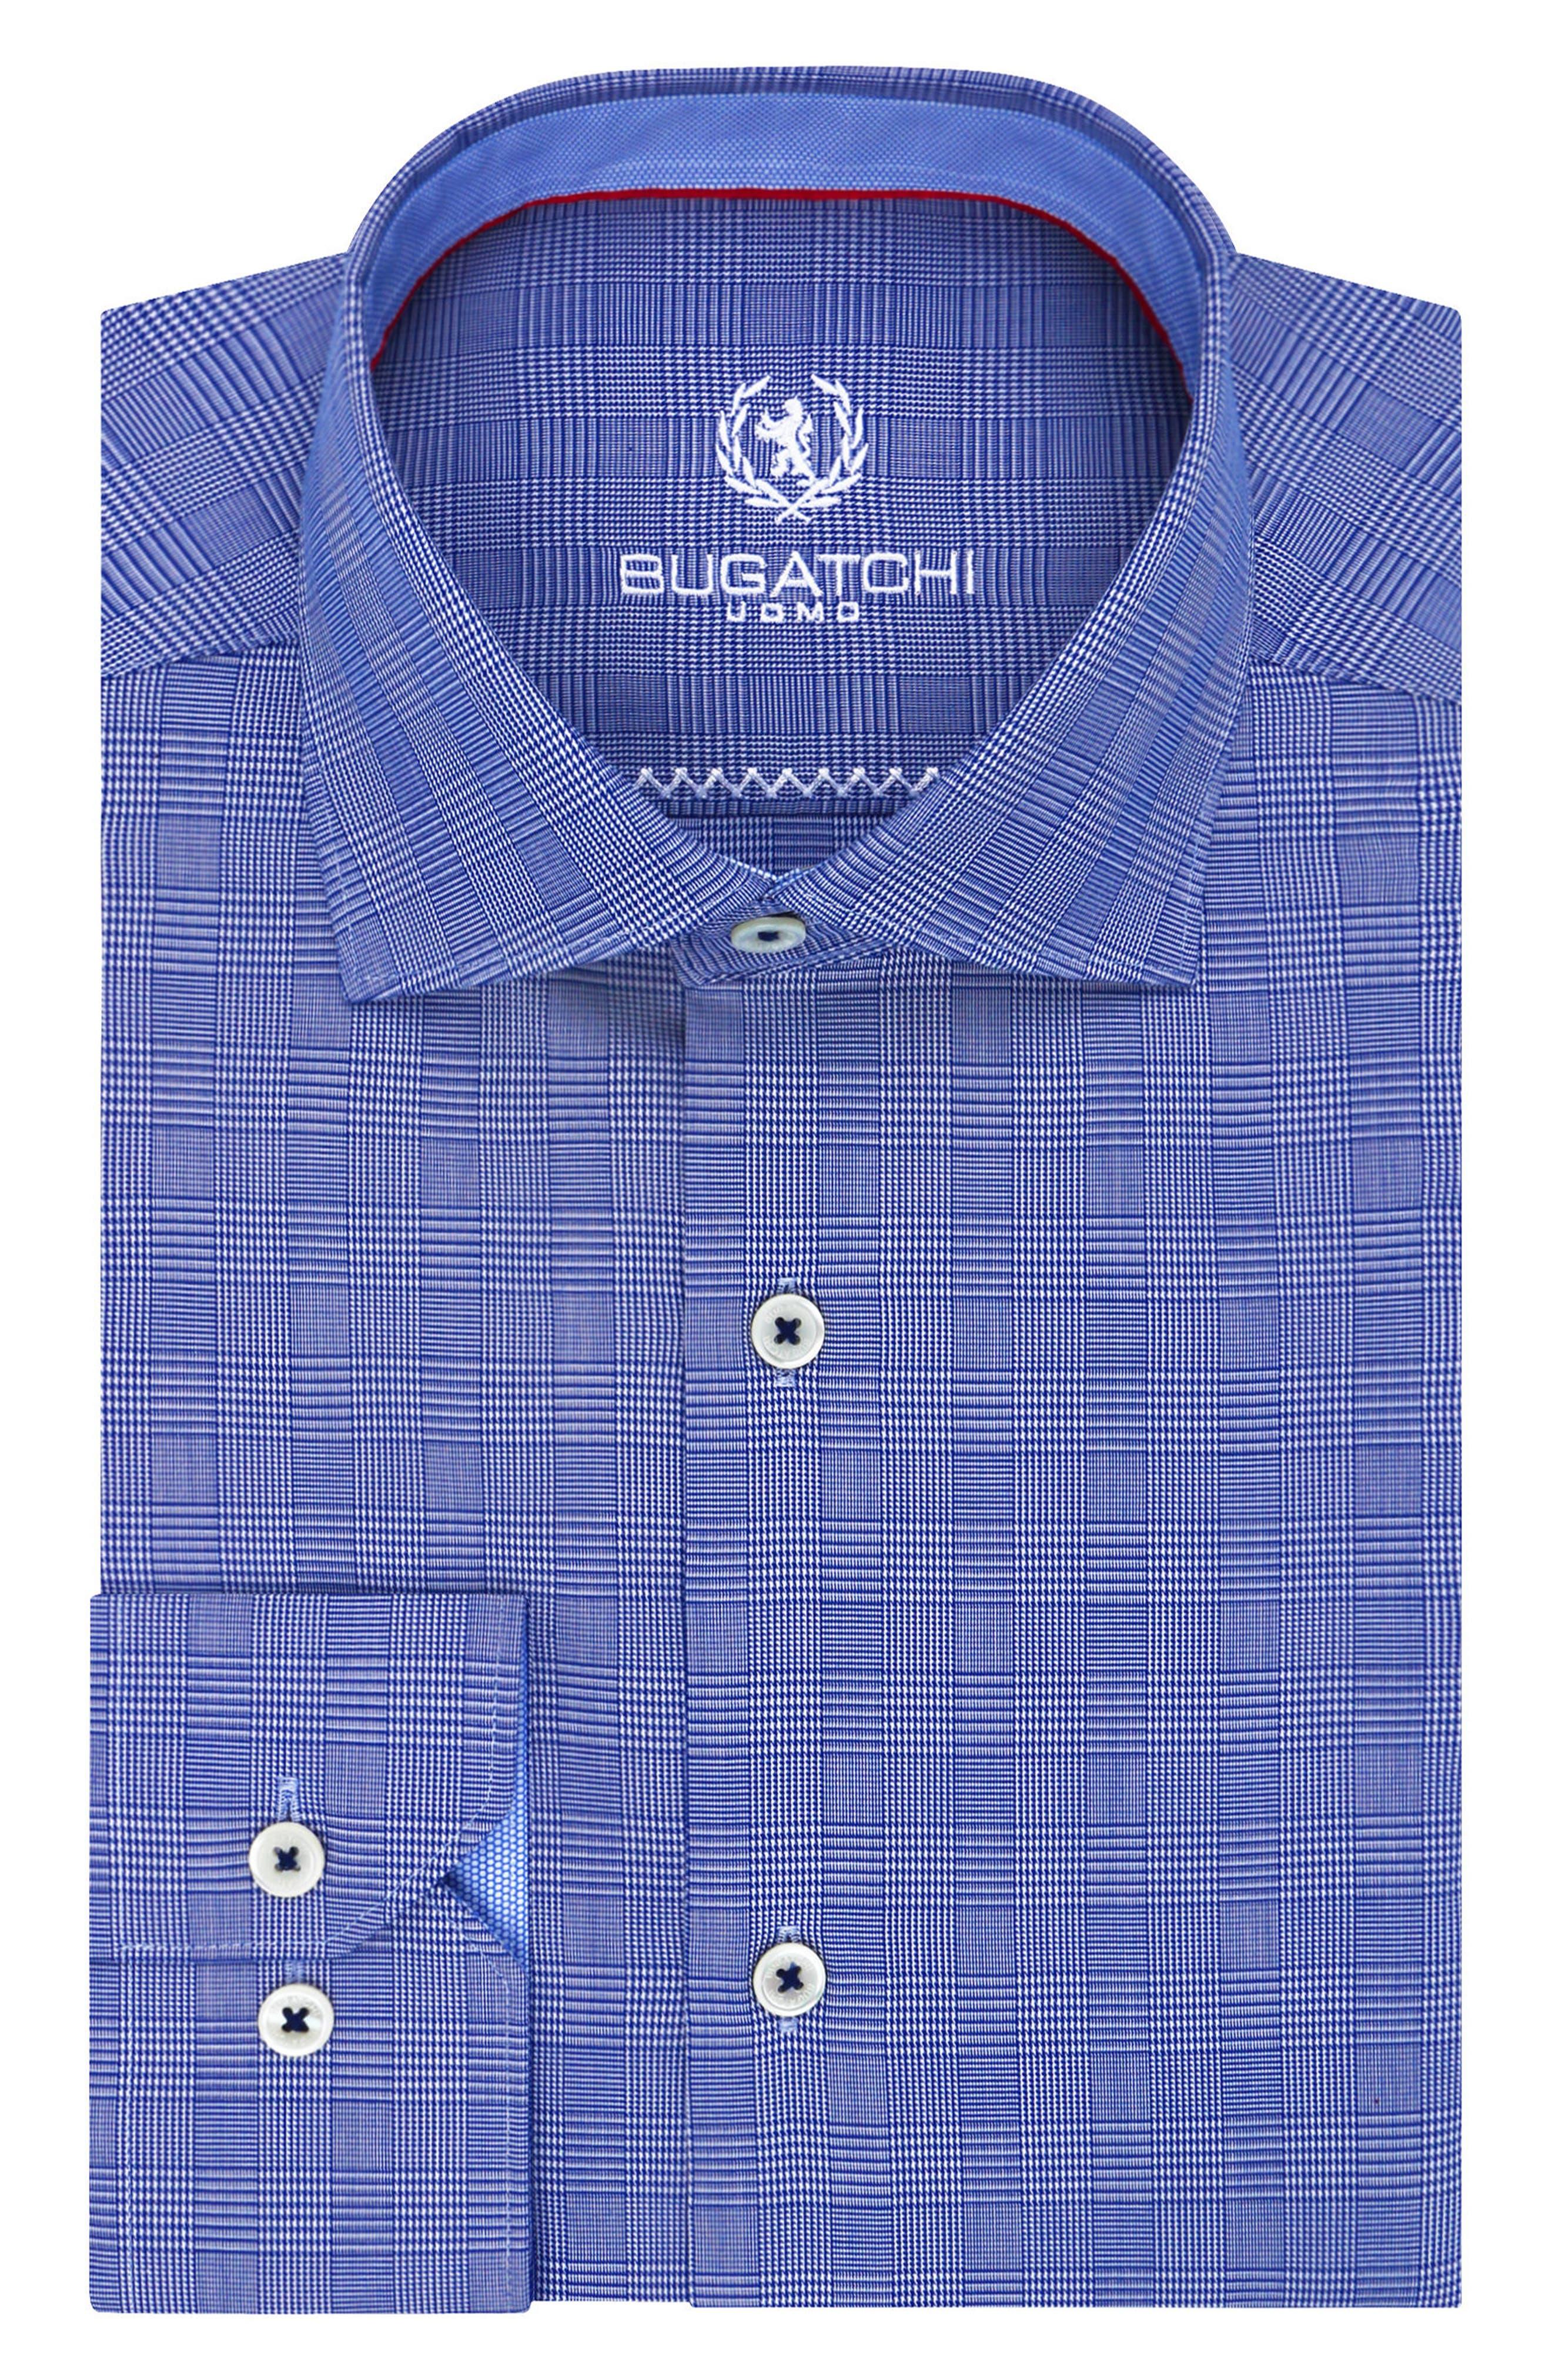 Main Image - Bugatchi Trim Fit Plaid Dress Shirt